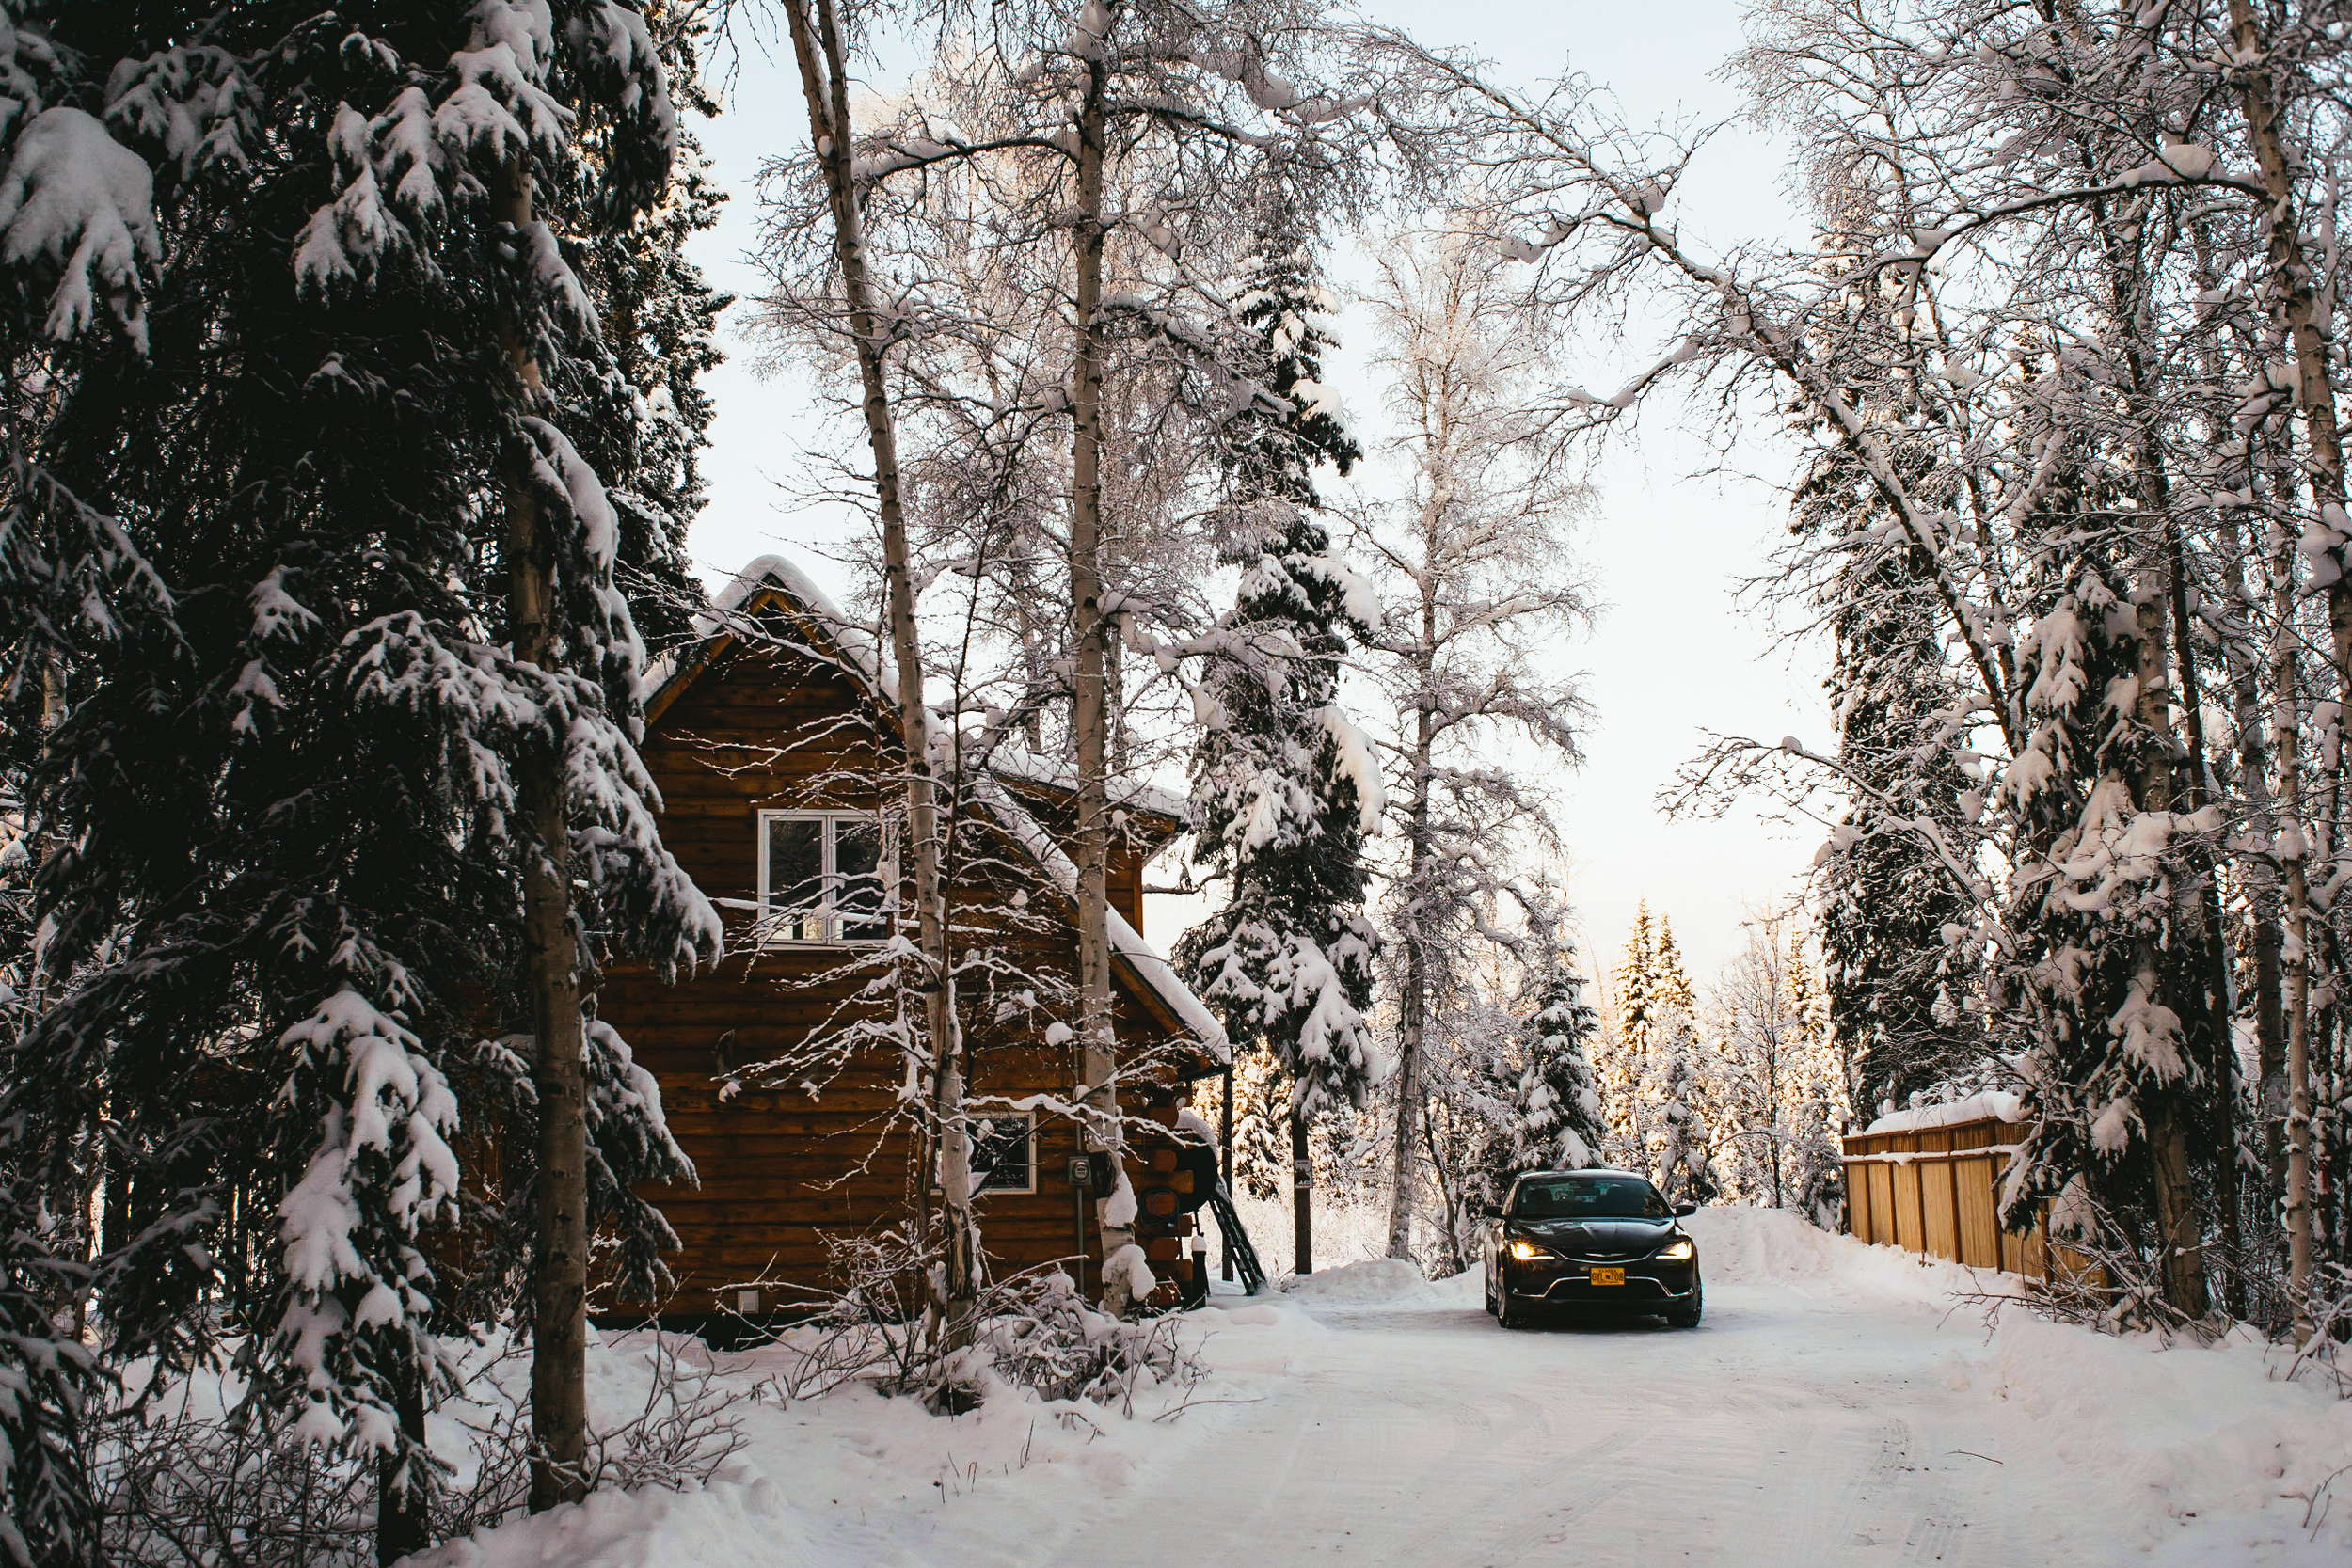 Driveway to Moose Walk Cabin.